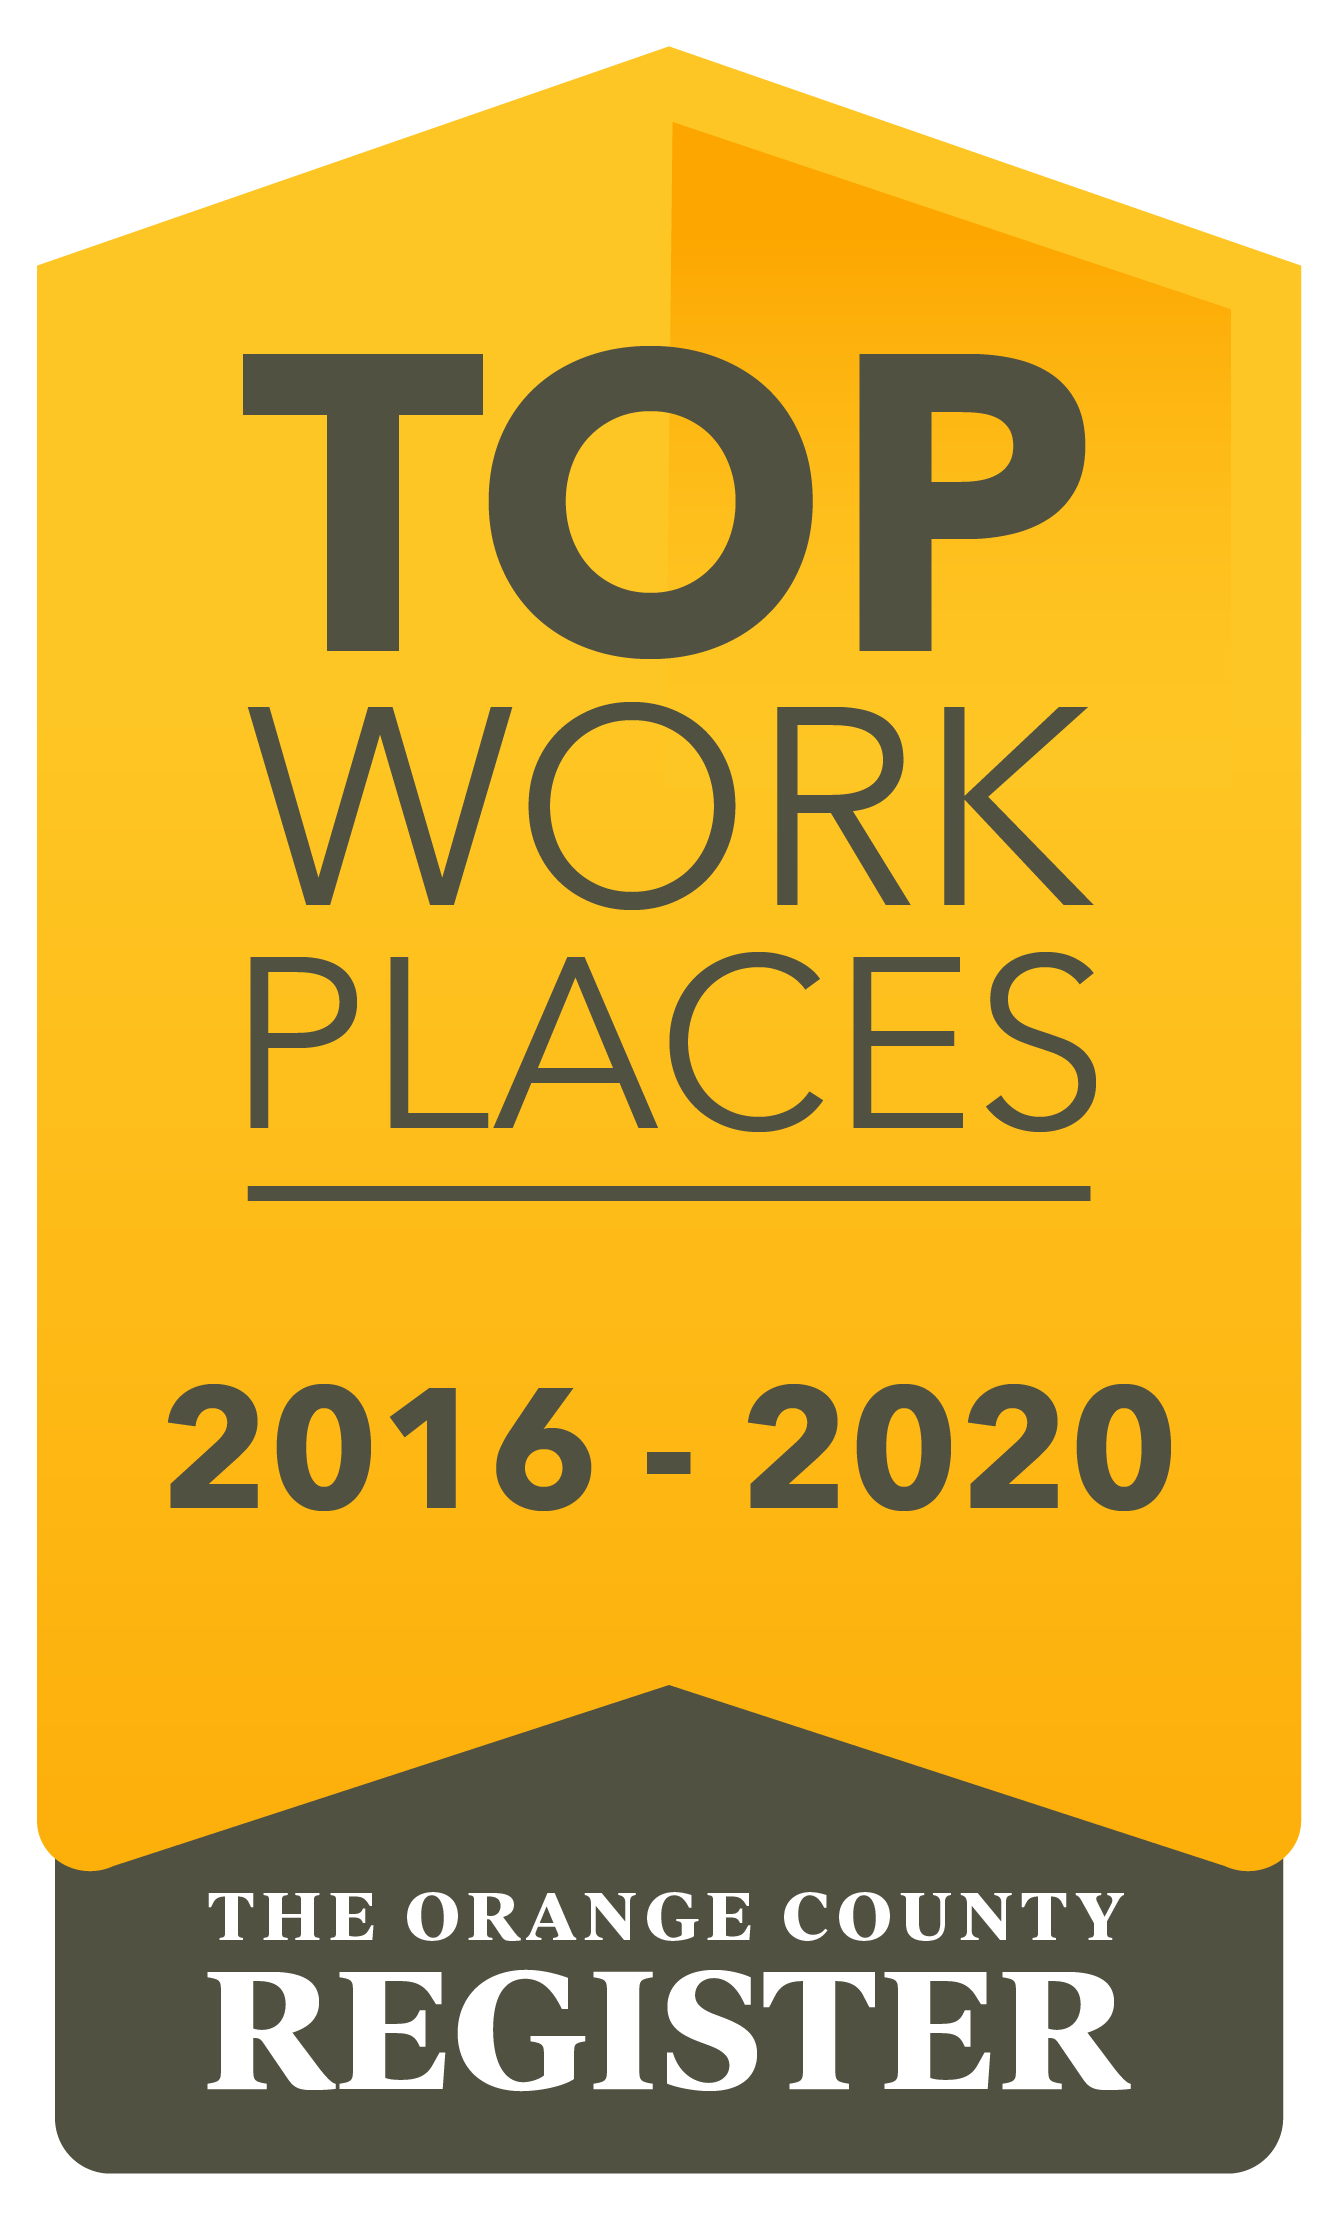 Orange County Register - Top Workplaces 2020, 2019, 2018, 2017, 2016